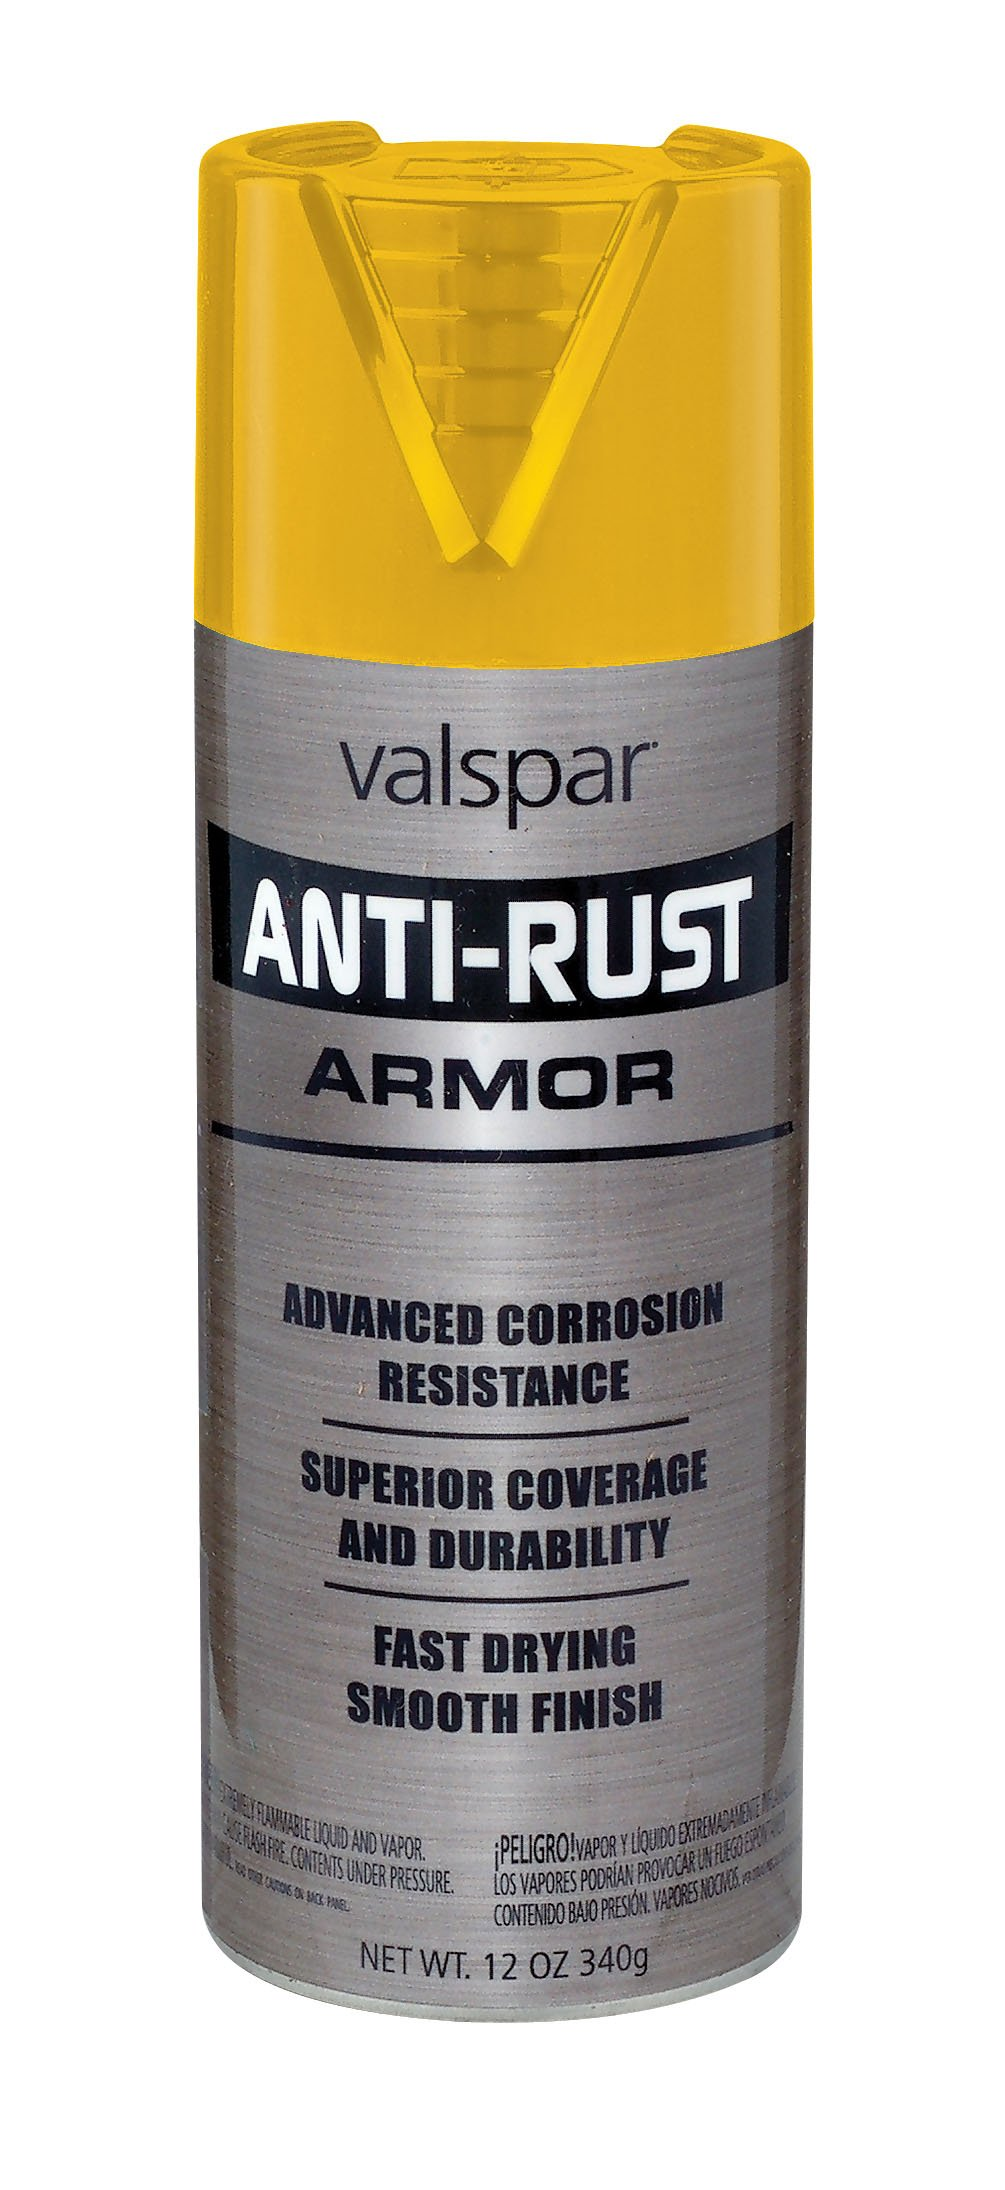 Valspar 21945 Gloss Safety Yellow Enamel - 12 oz.